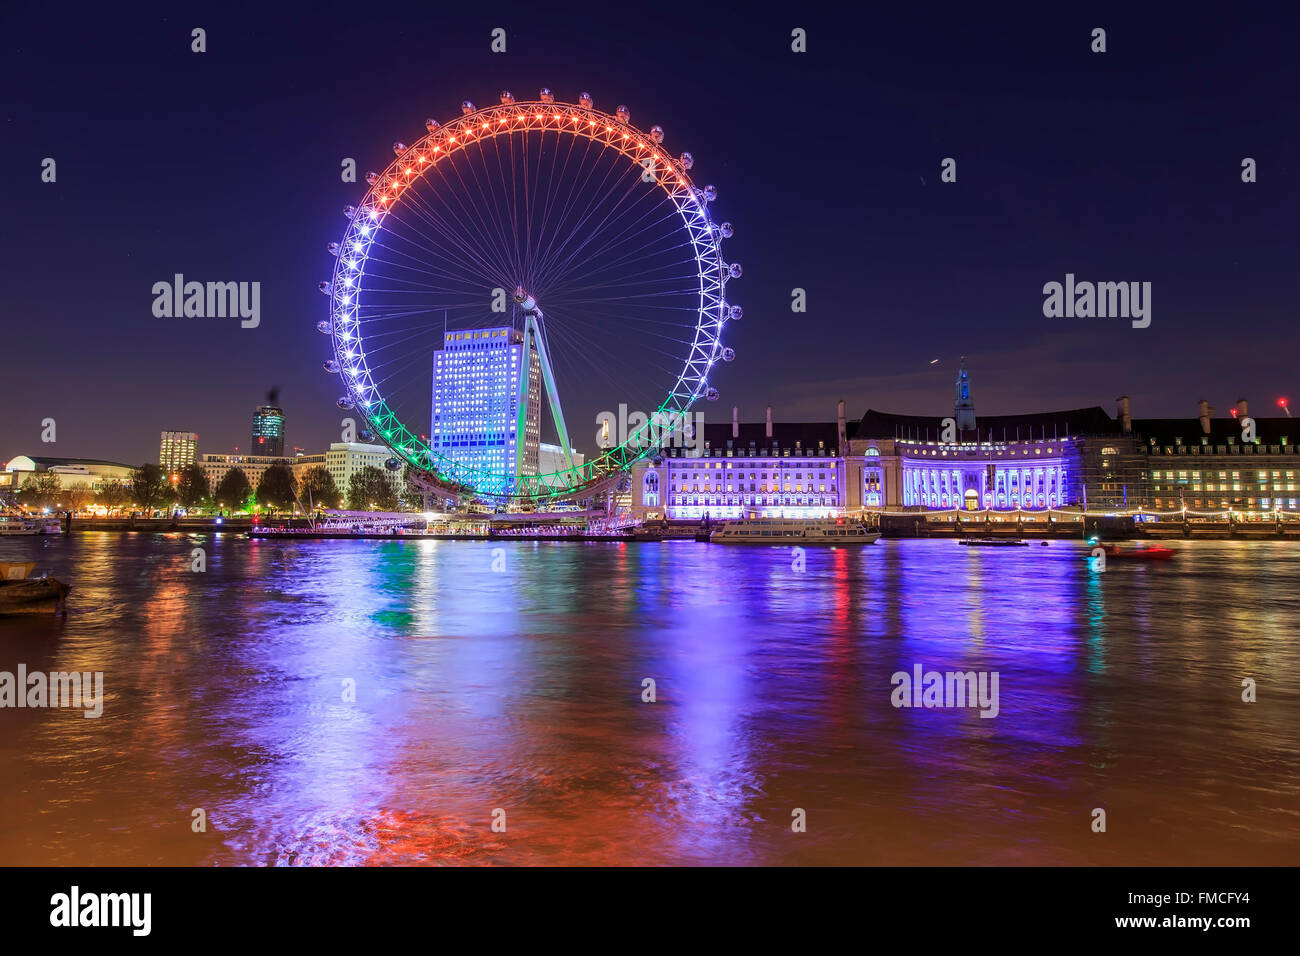 Traveling in the famous London Eye, London, United Kingdom around twilight - Stock Image